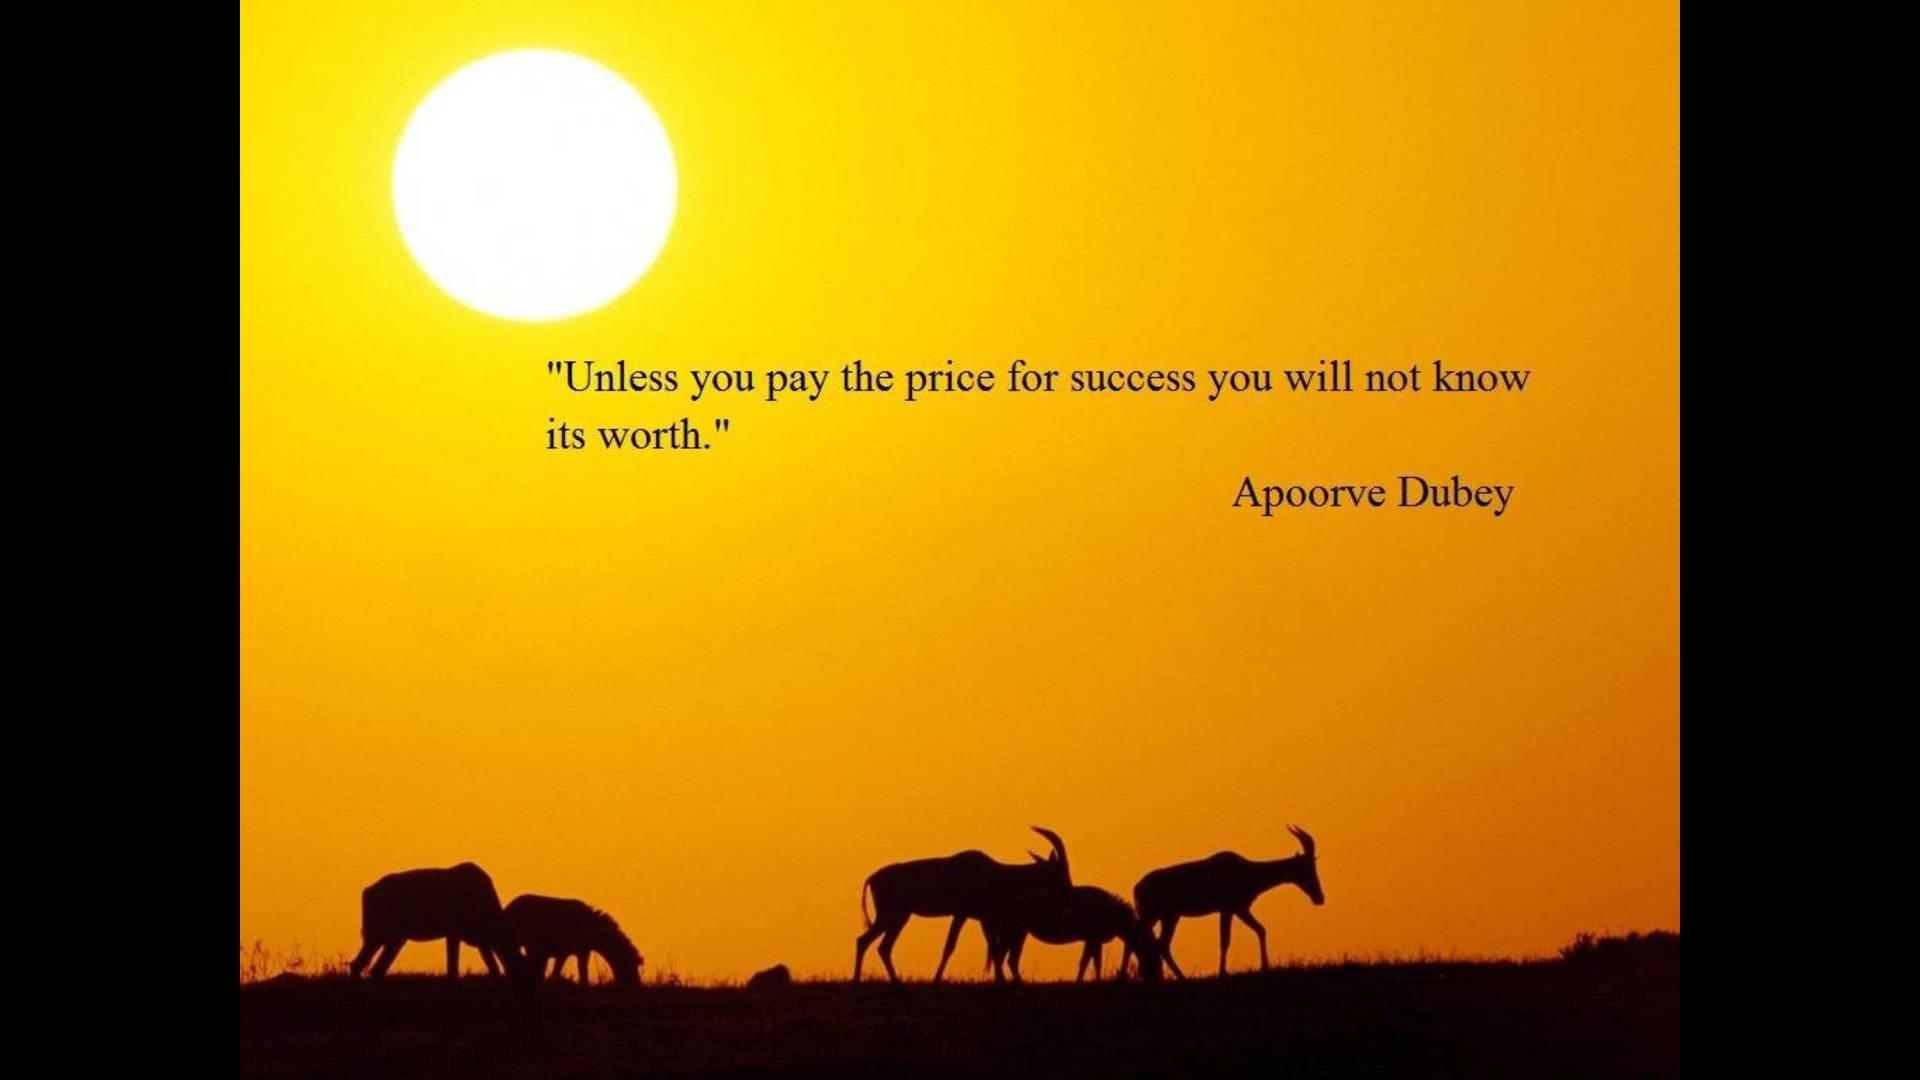 Quotes About Success Wallpaper Success Quotes That Make Sense 1920x1080